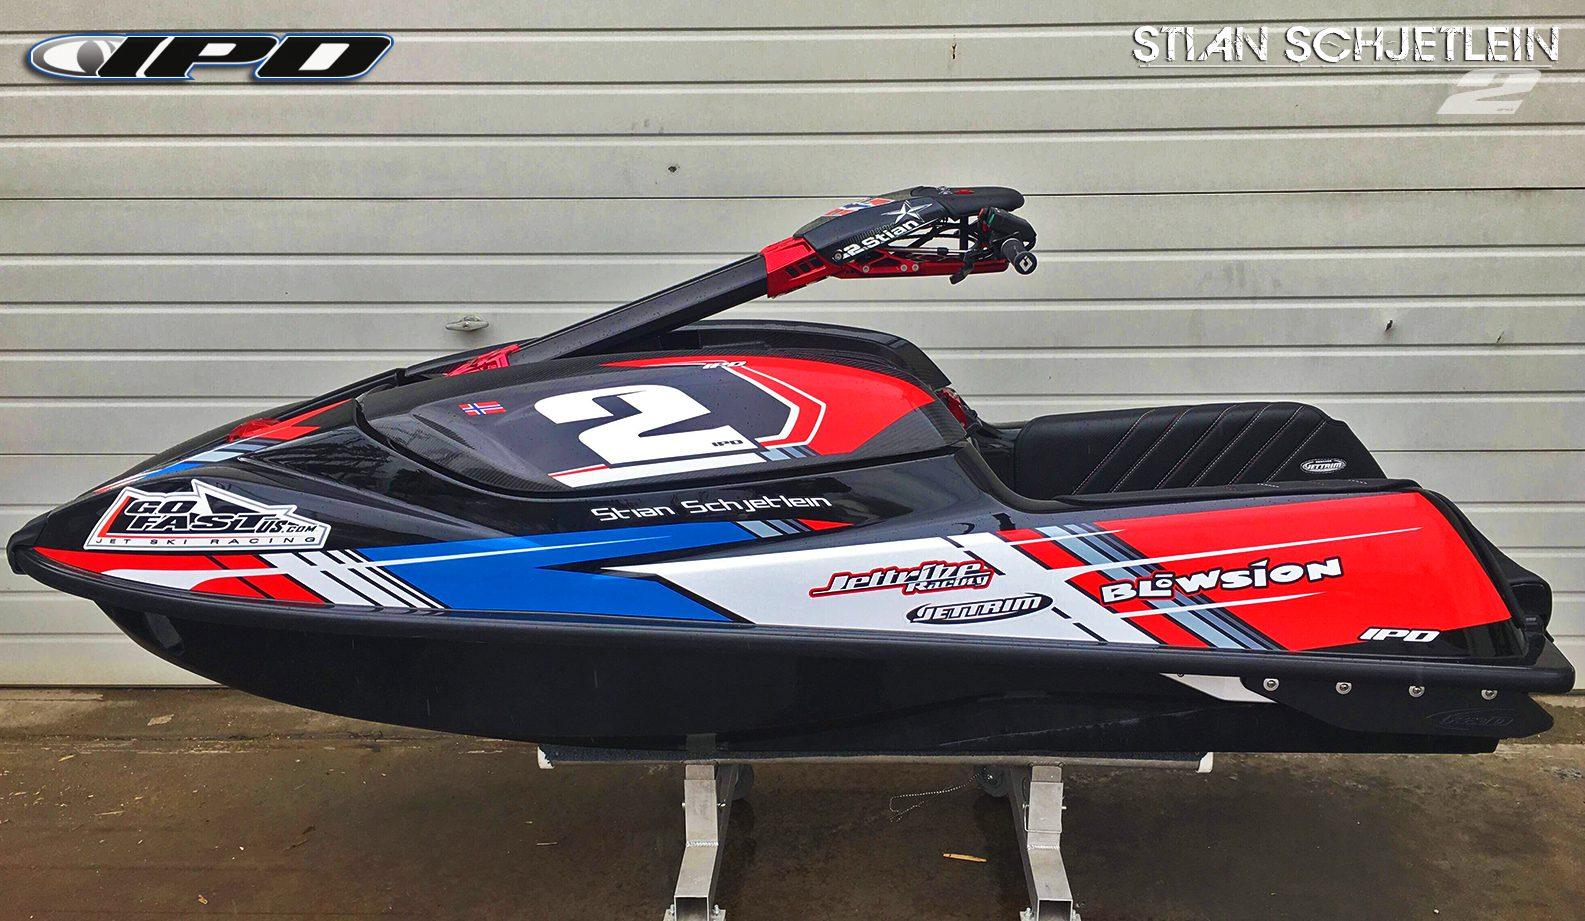 GK-RM-SXR4 installed on the Kawasaki SXR 1500